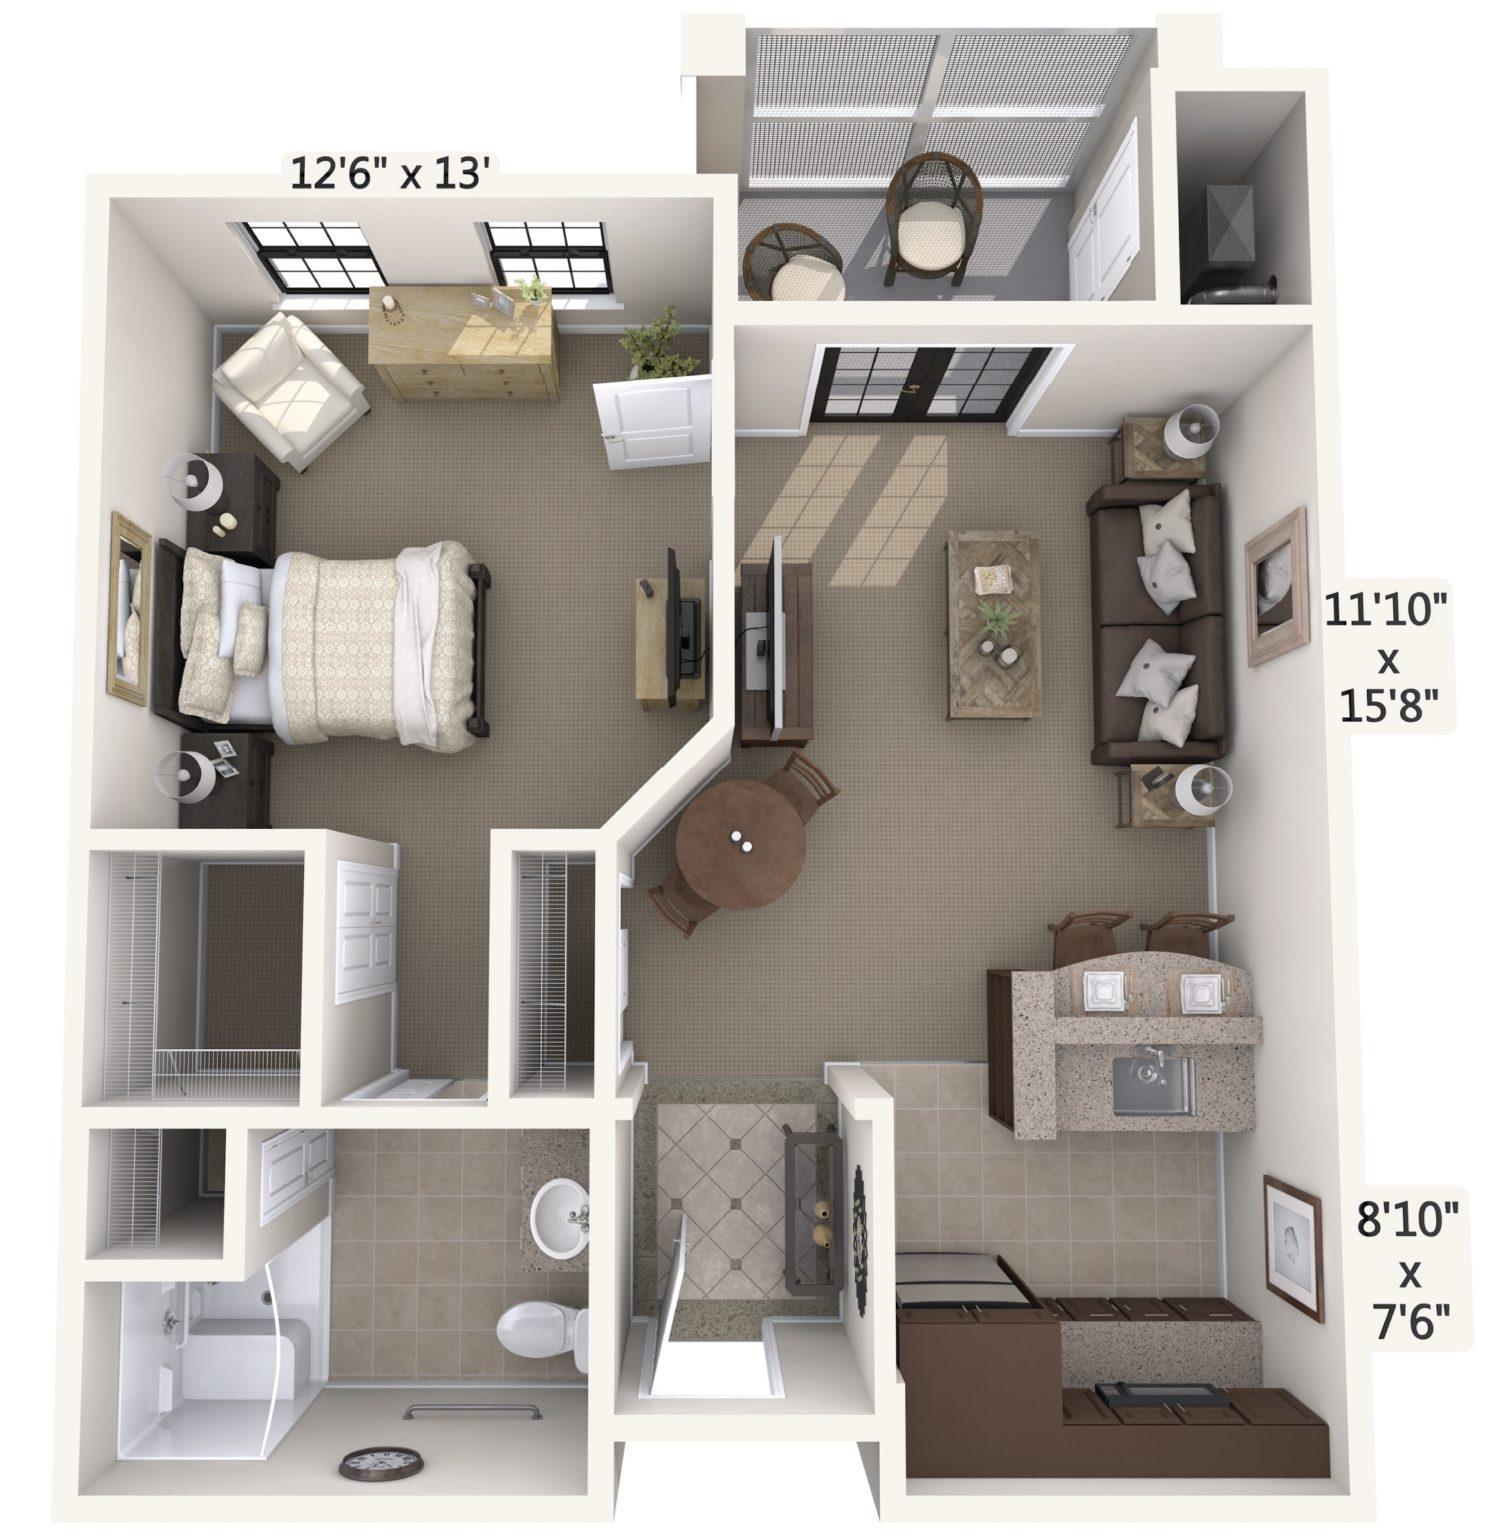 Addington_Place_One-Bedroom-Harmony_623-sq.-ft._AL_Jupiter-1508x1536